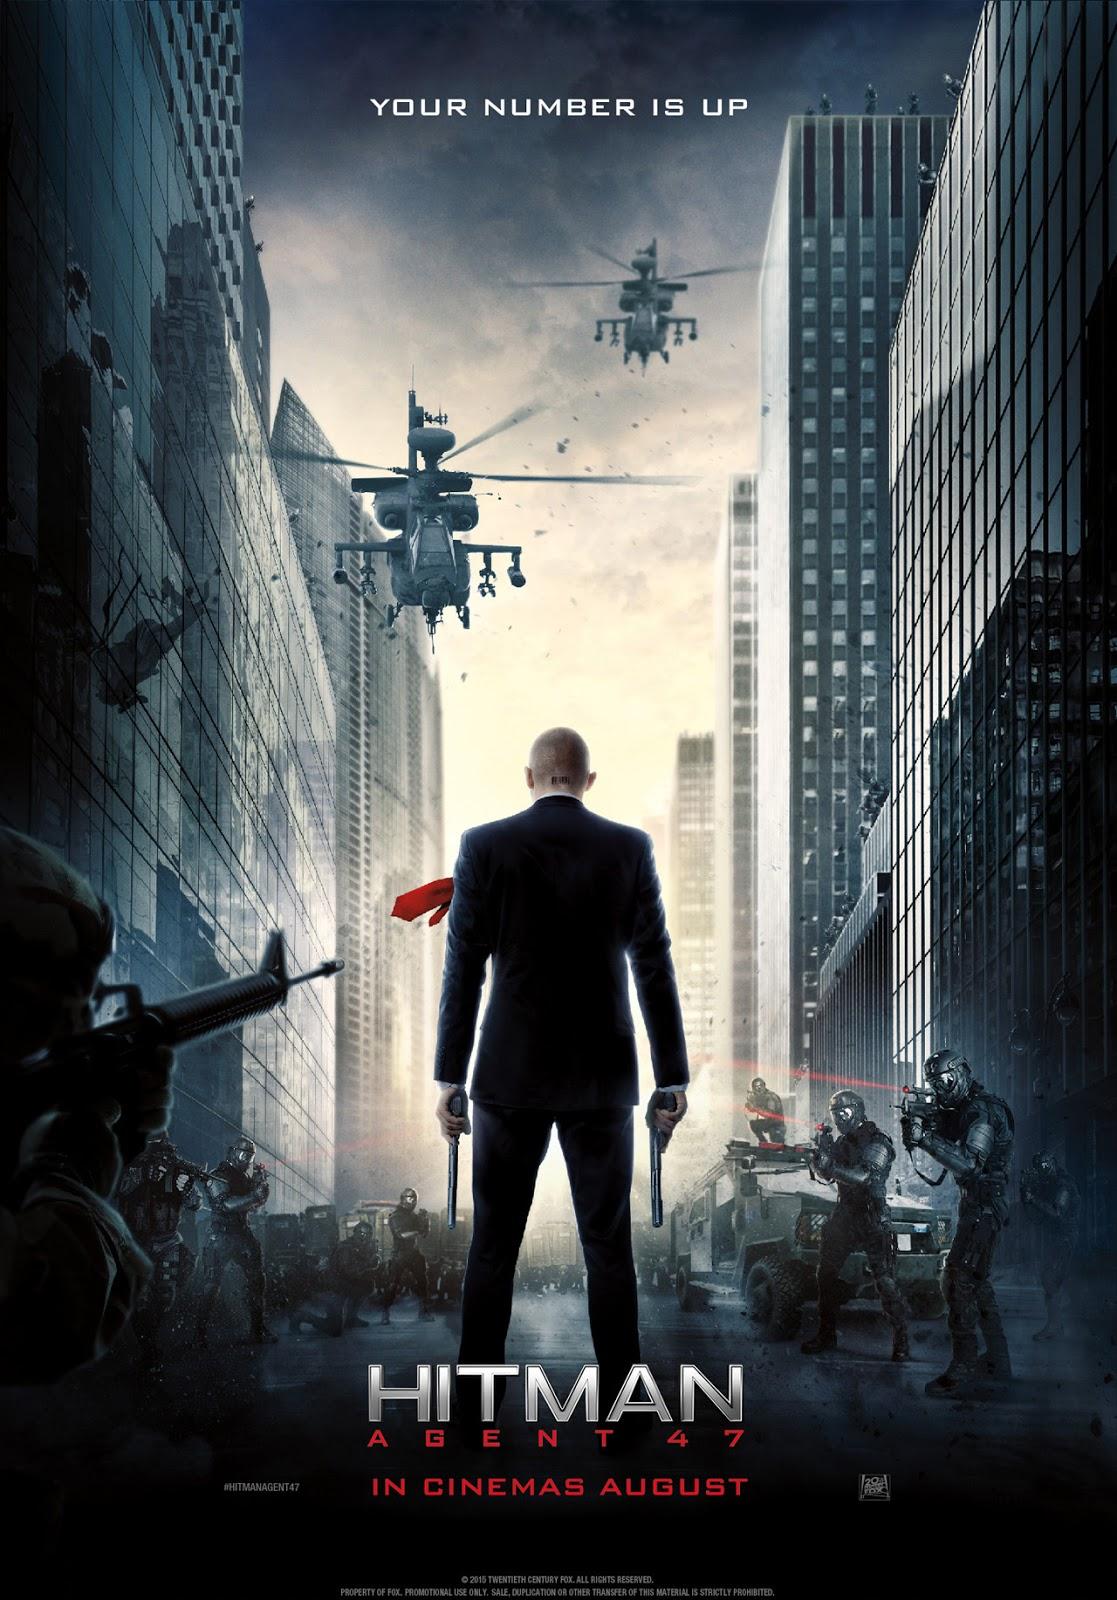 Hitman: Agent 47 (2015) ฮิทแมน: สายลับ 47 [Zoom V.2] [มาแล้ว ชัดกว่าเดิมมาก]